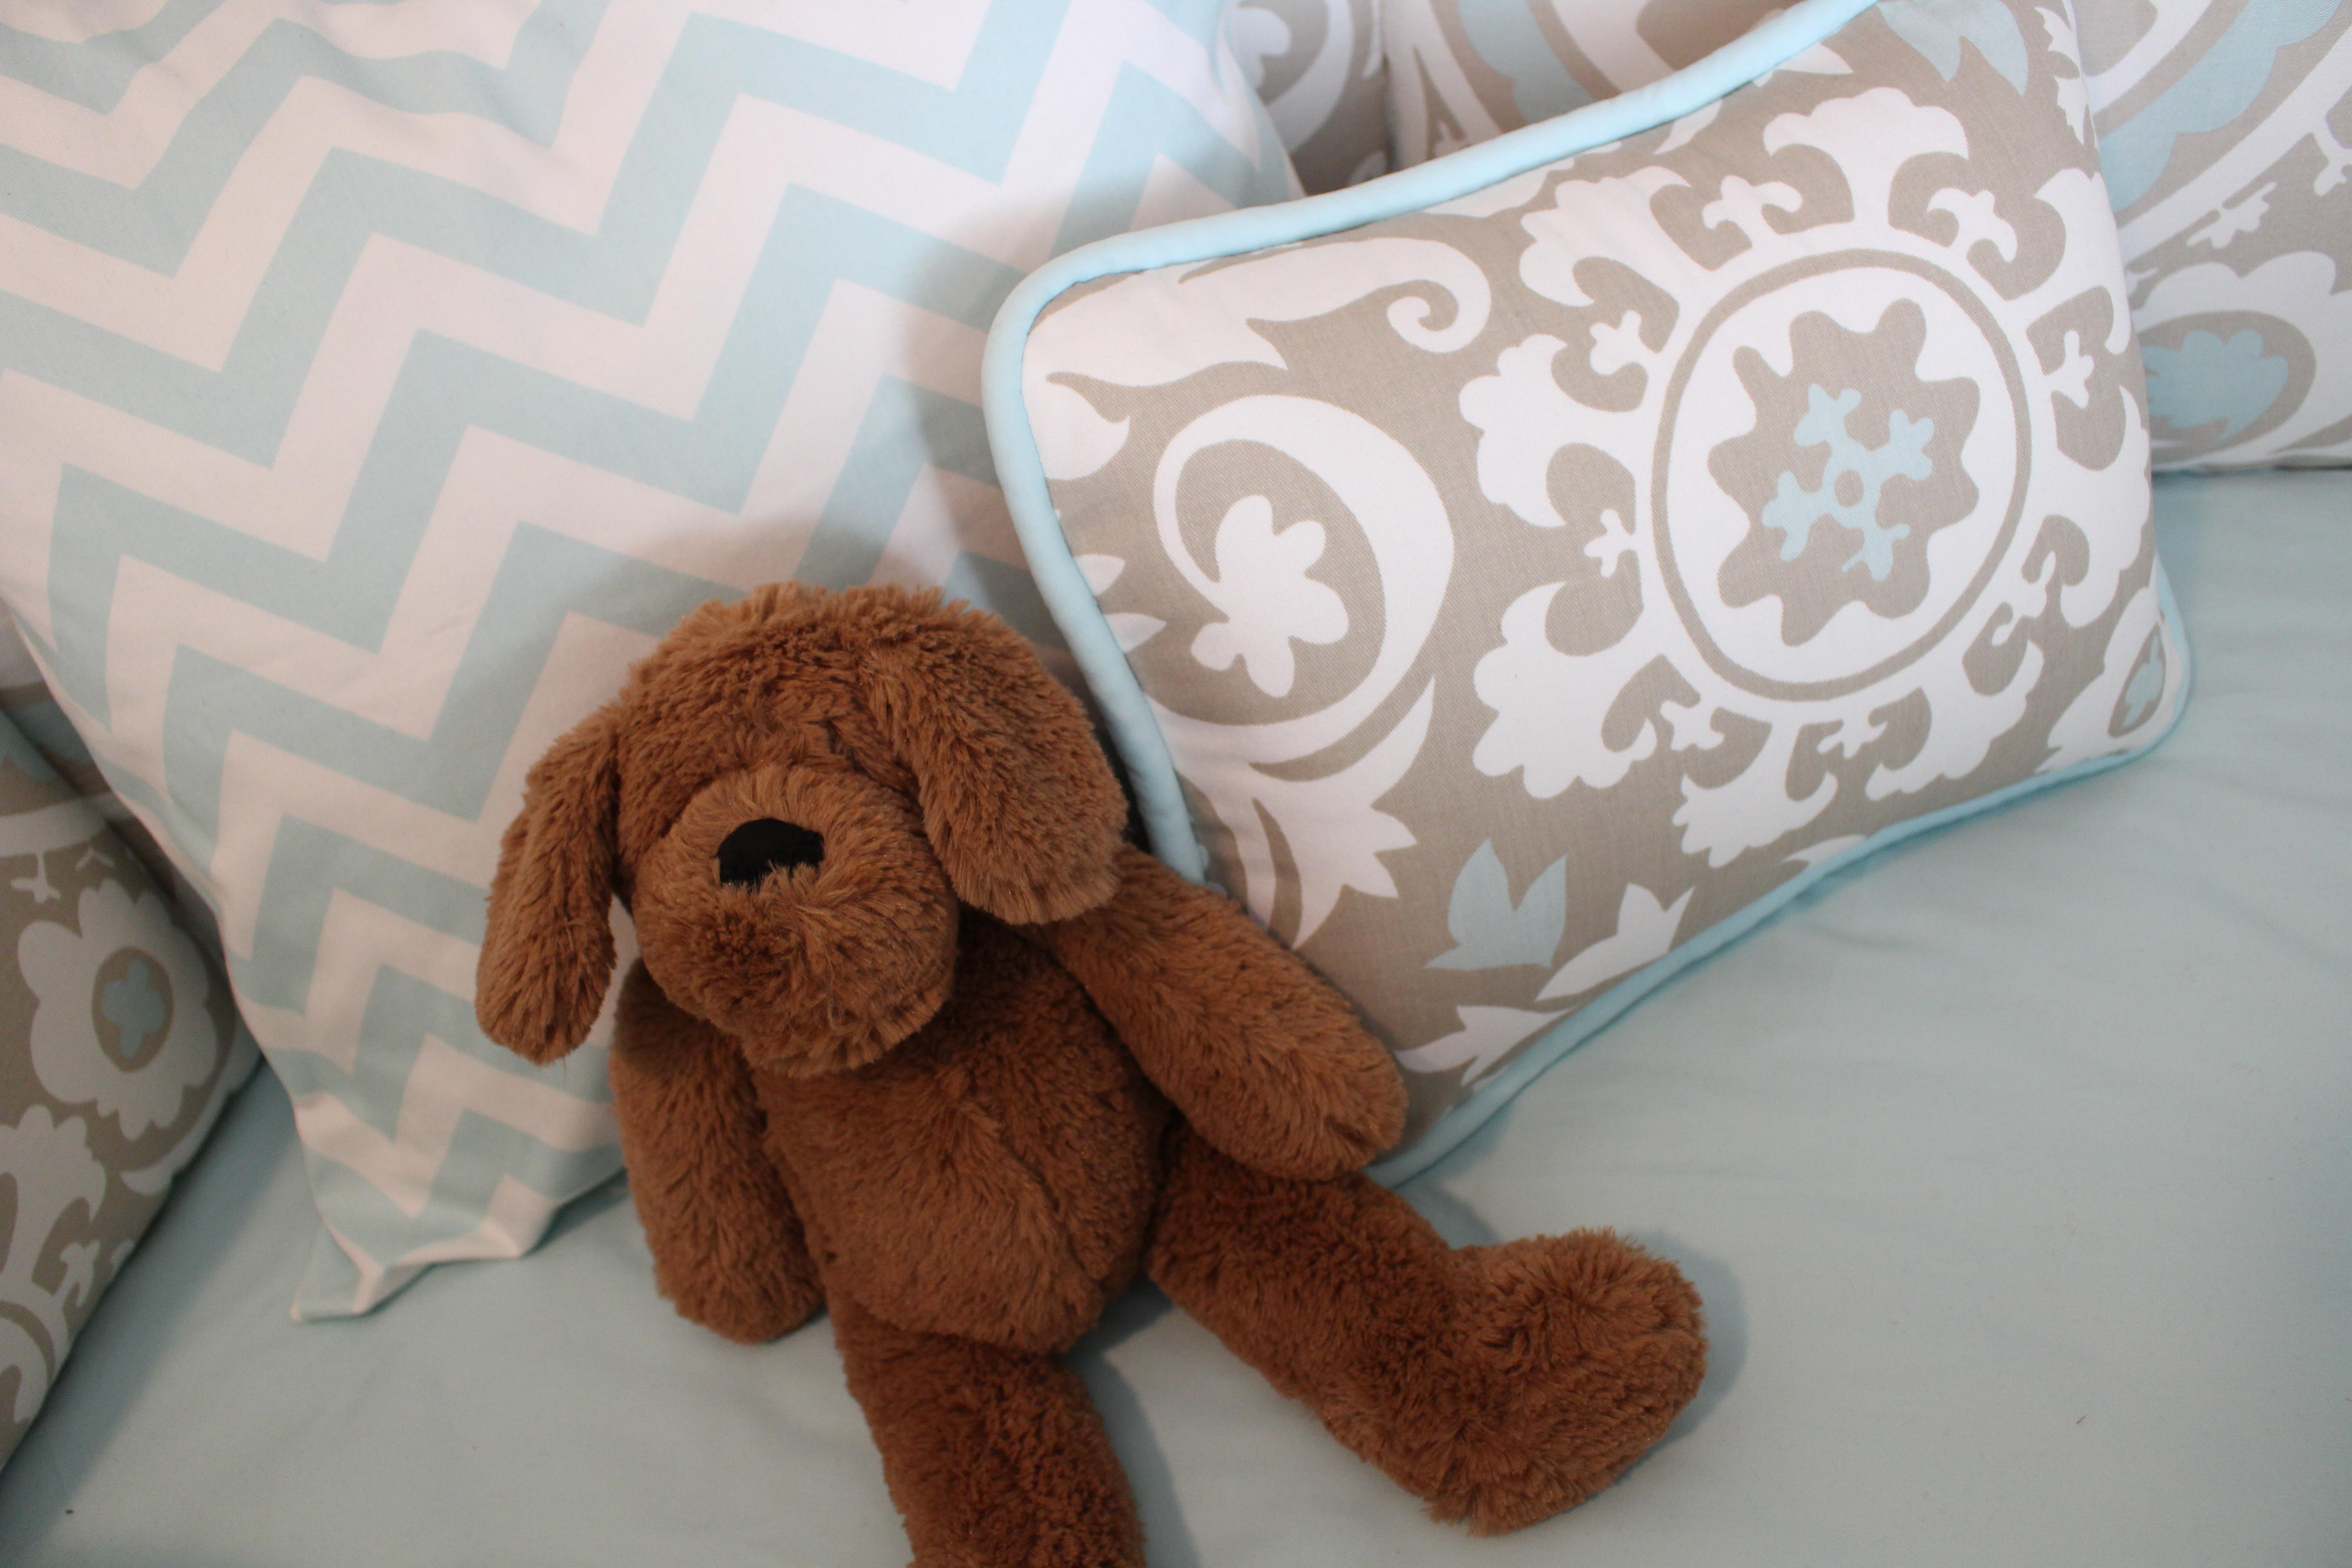 Taupe Suzani Crib Bedding and Chevron Throw Pillow